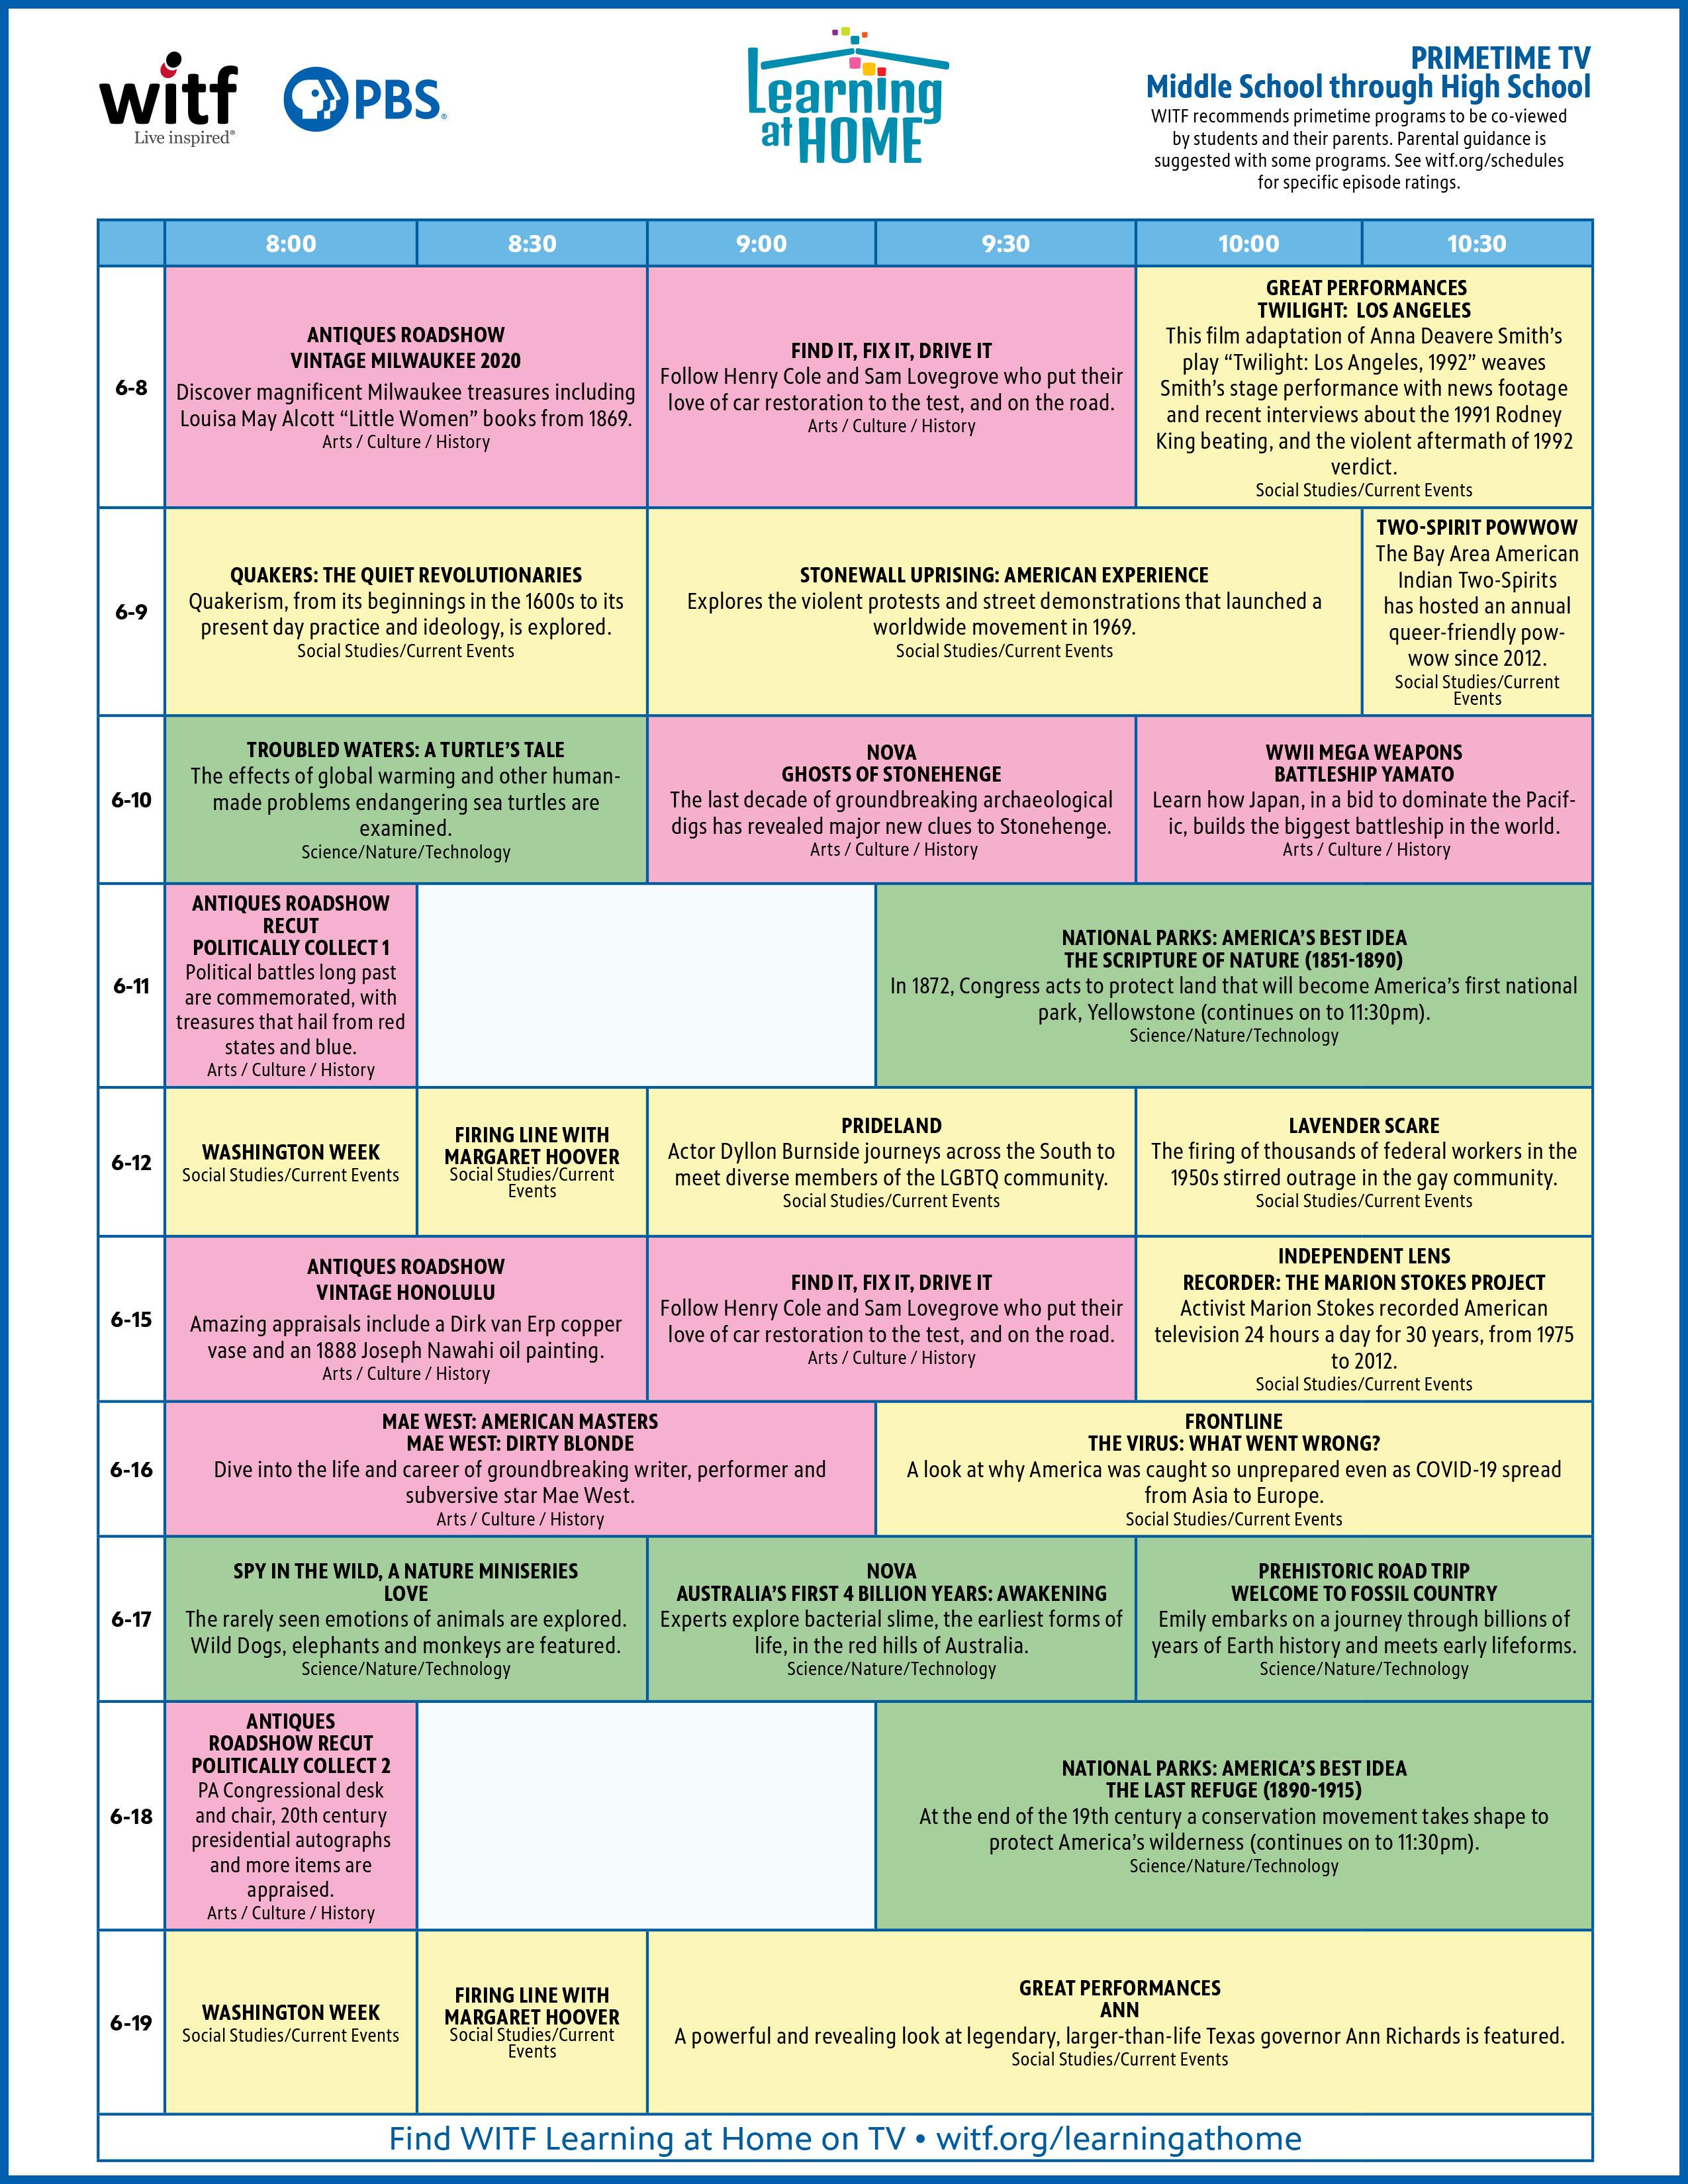 Primetime Middle School through High School Schedule